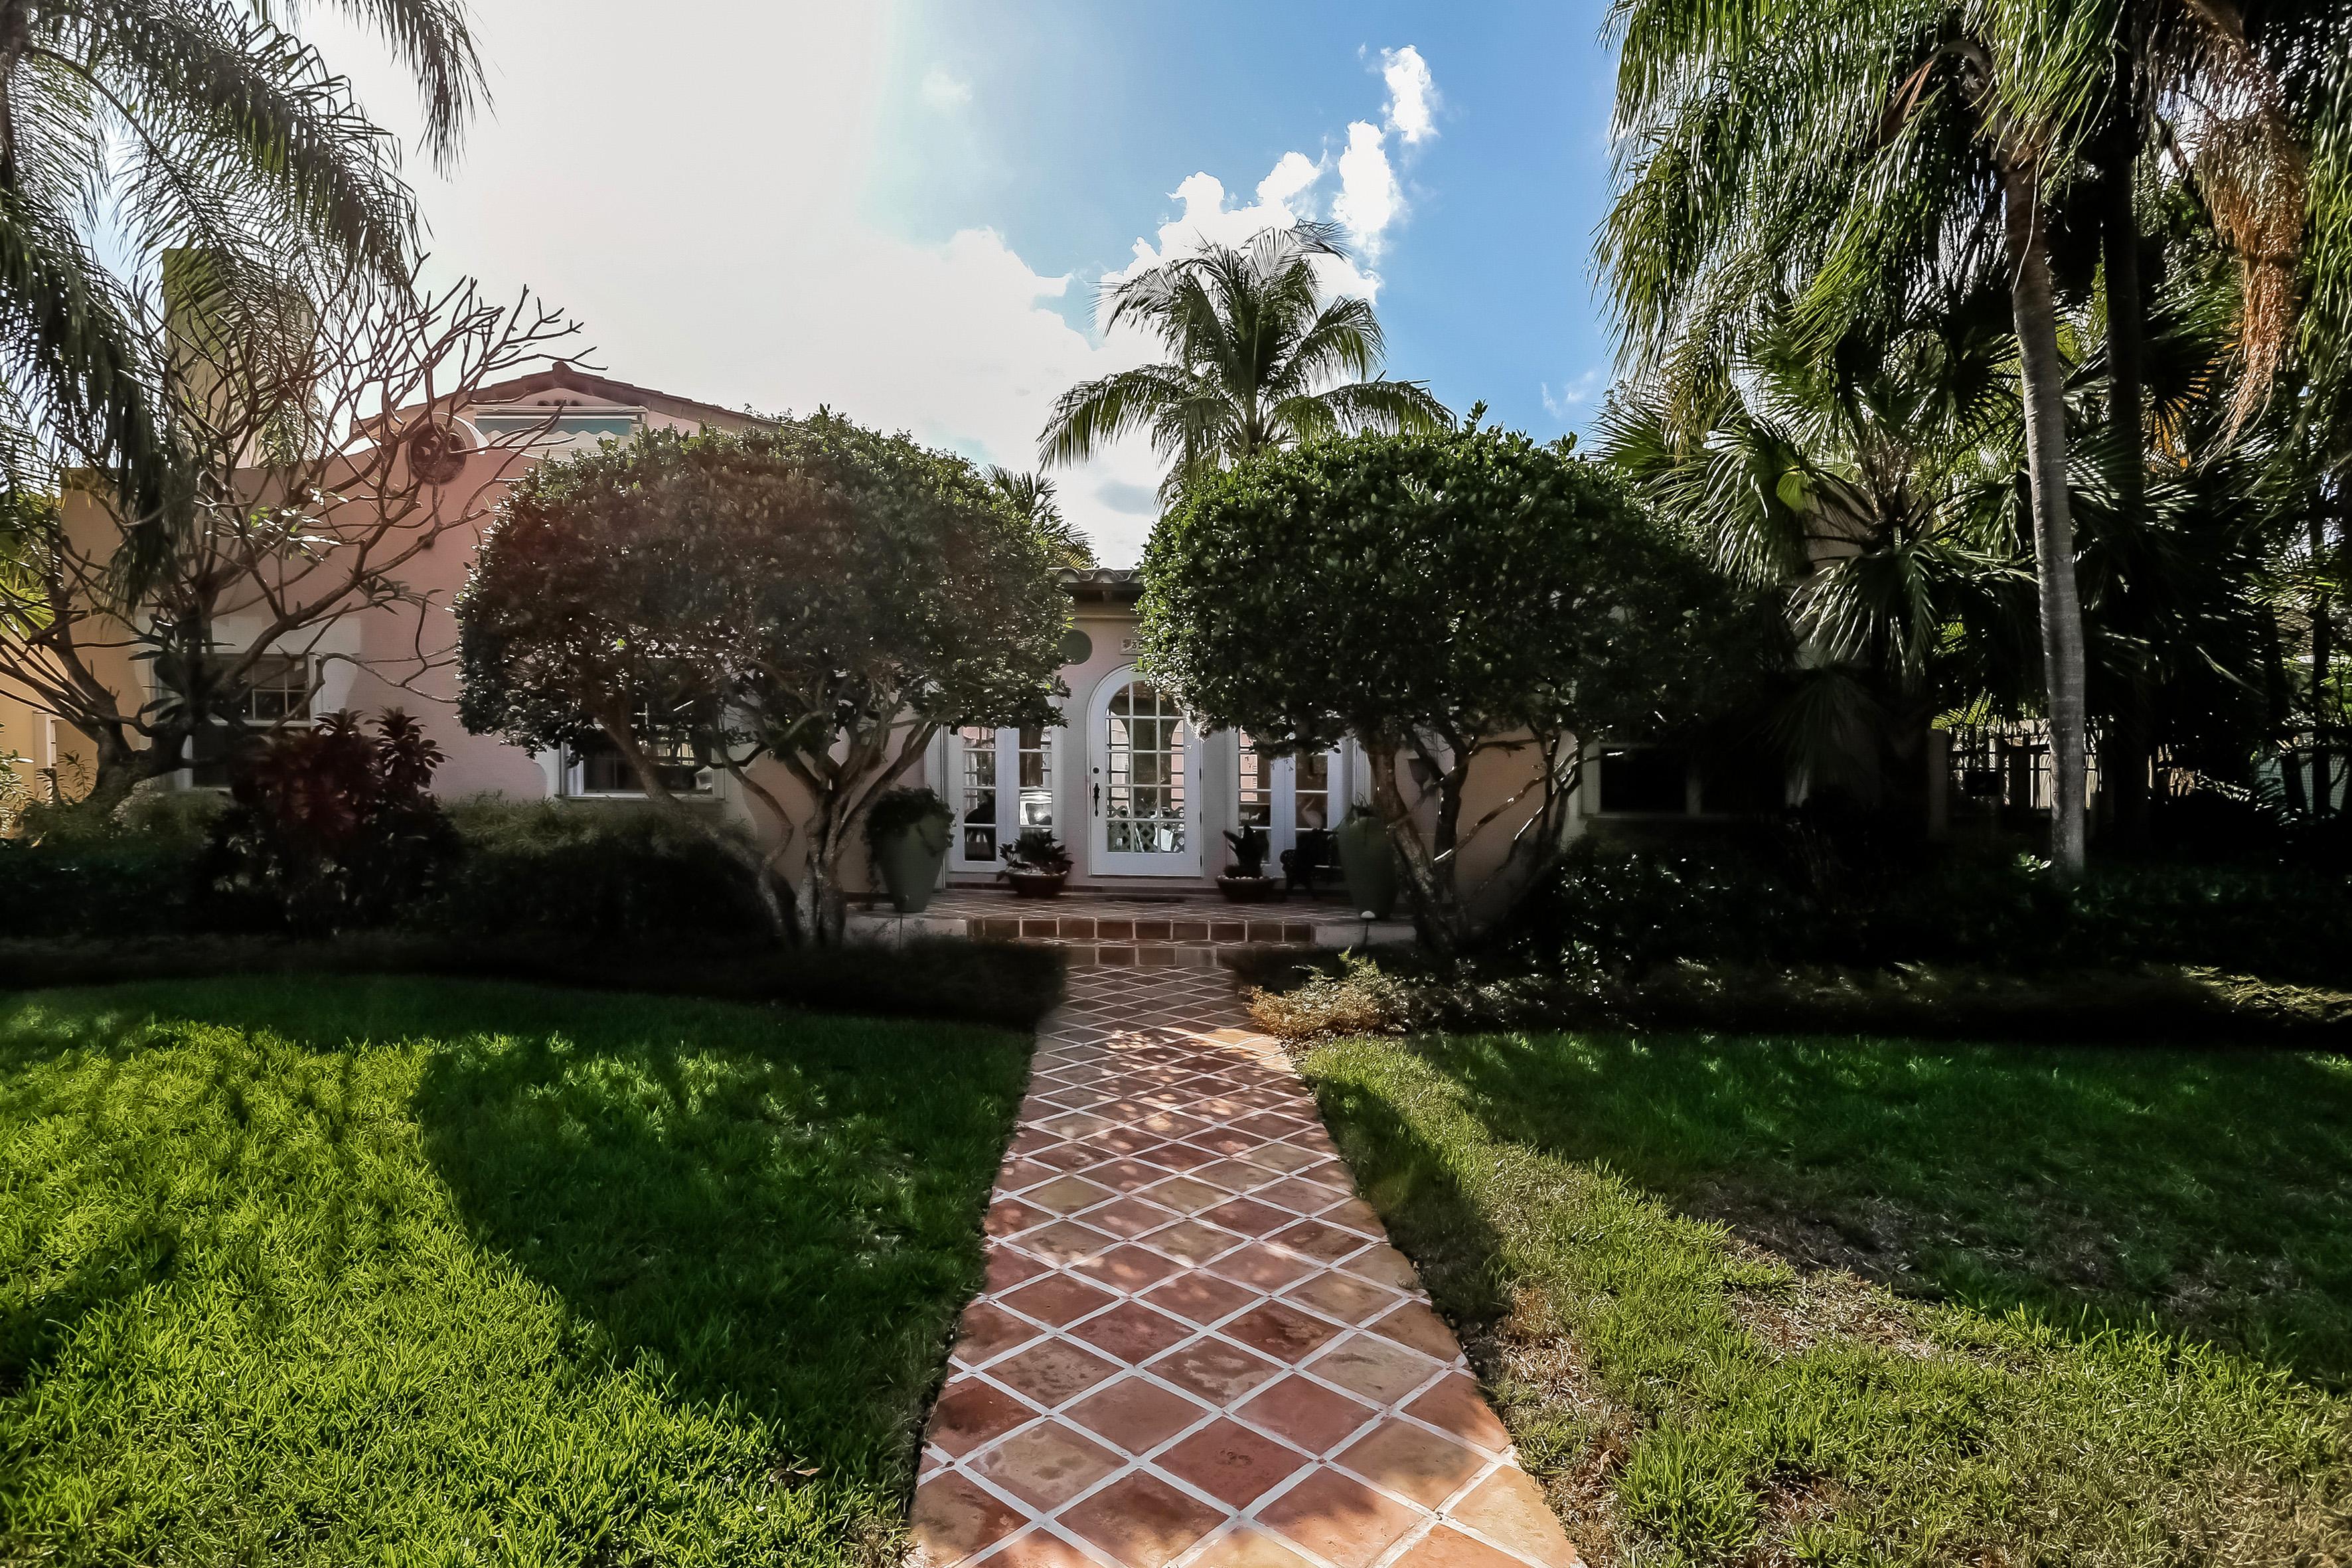 Single Family Home for Sale at 3538 Flamingo Dr Miami Beach, Florida, 33140 United States